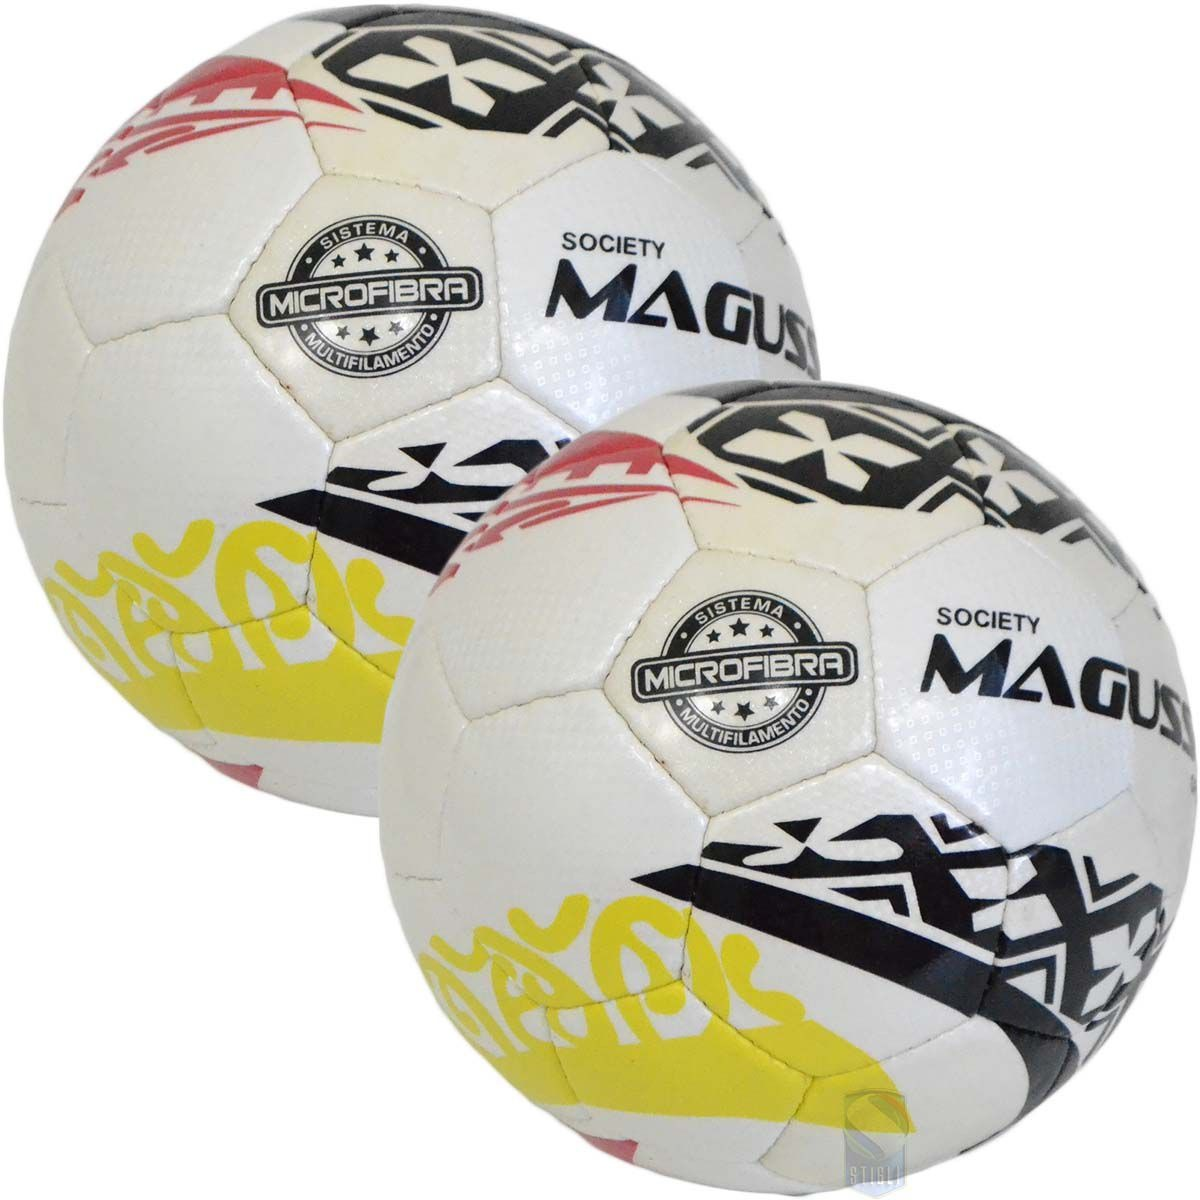 9f4f14adfa936 Kit C 2 Bolas Magussy Microfibra Ofc Elite Futebol 7 Society